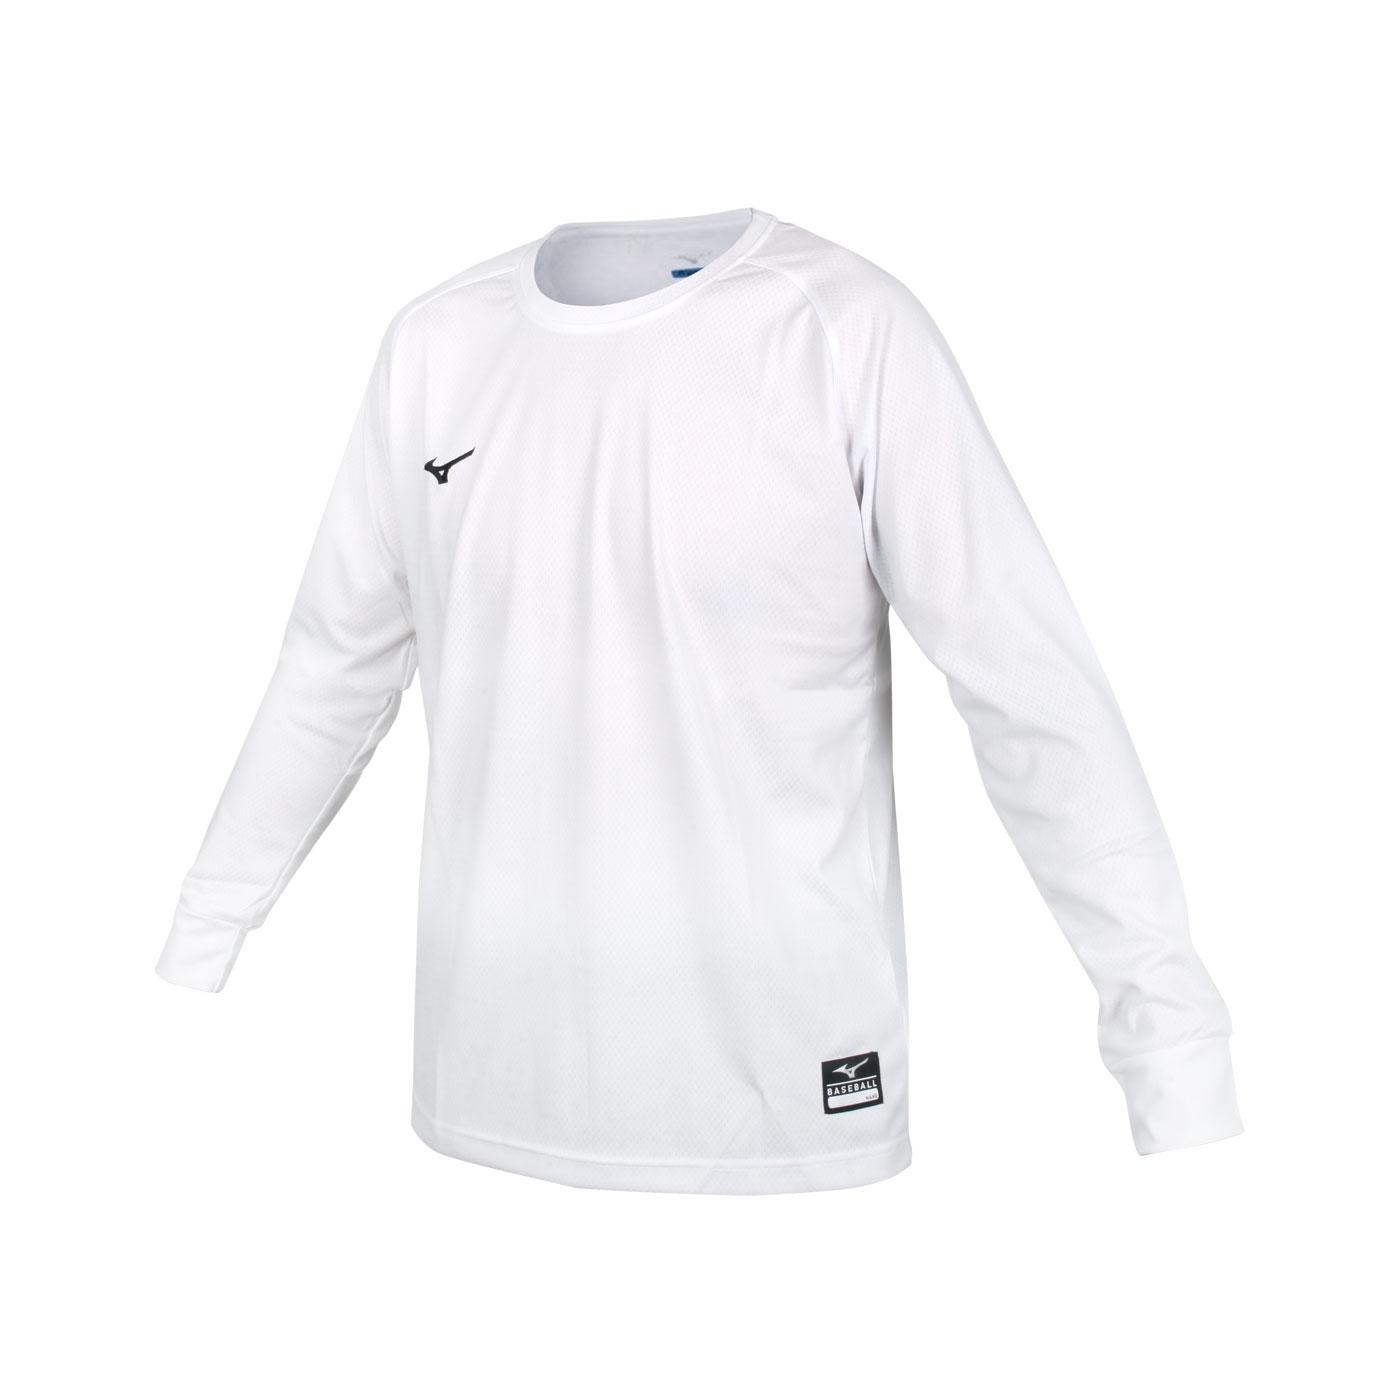 MIZUNO 男款長袖T恤 12TC0L3101 - 白黑